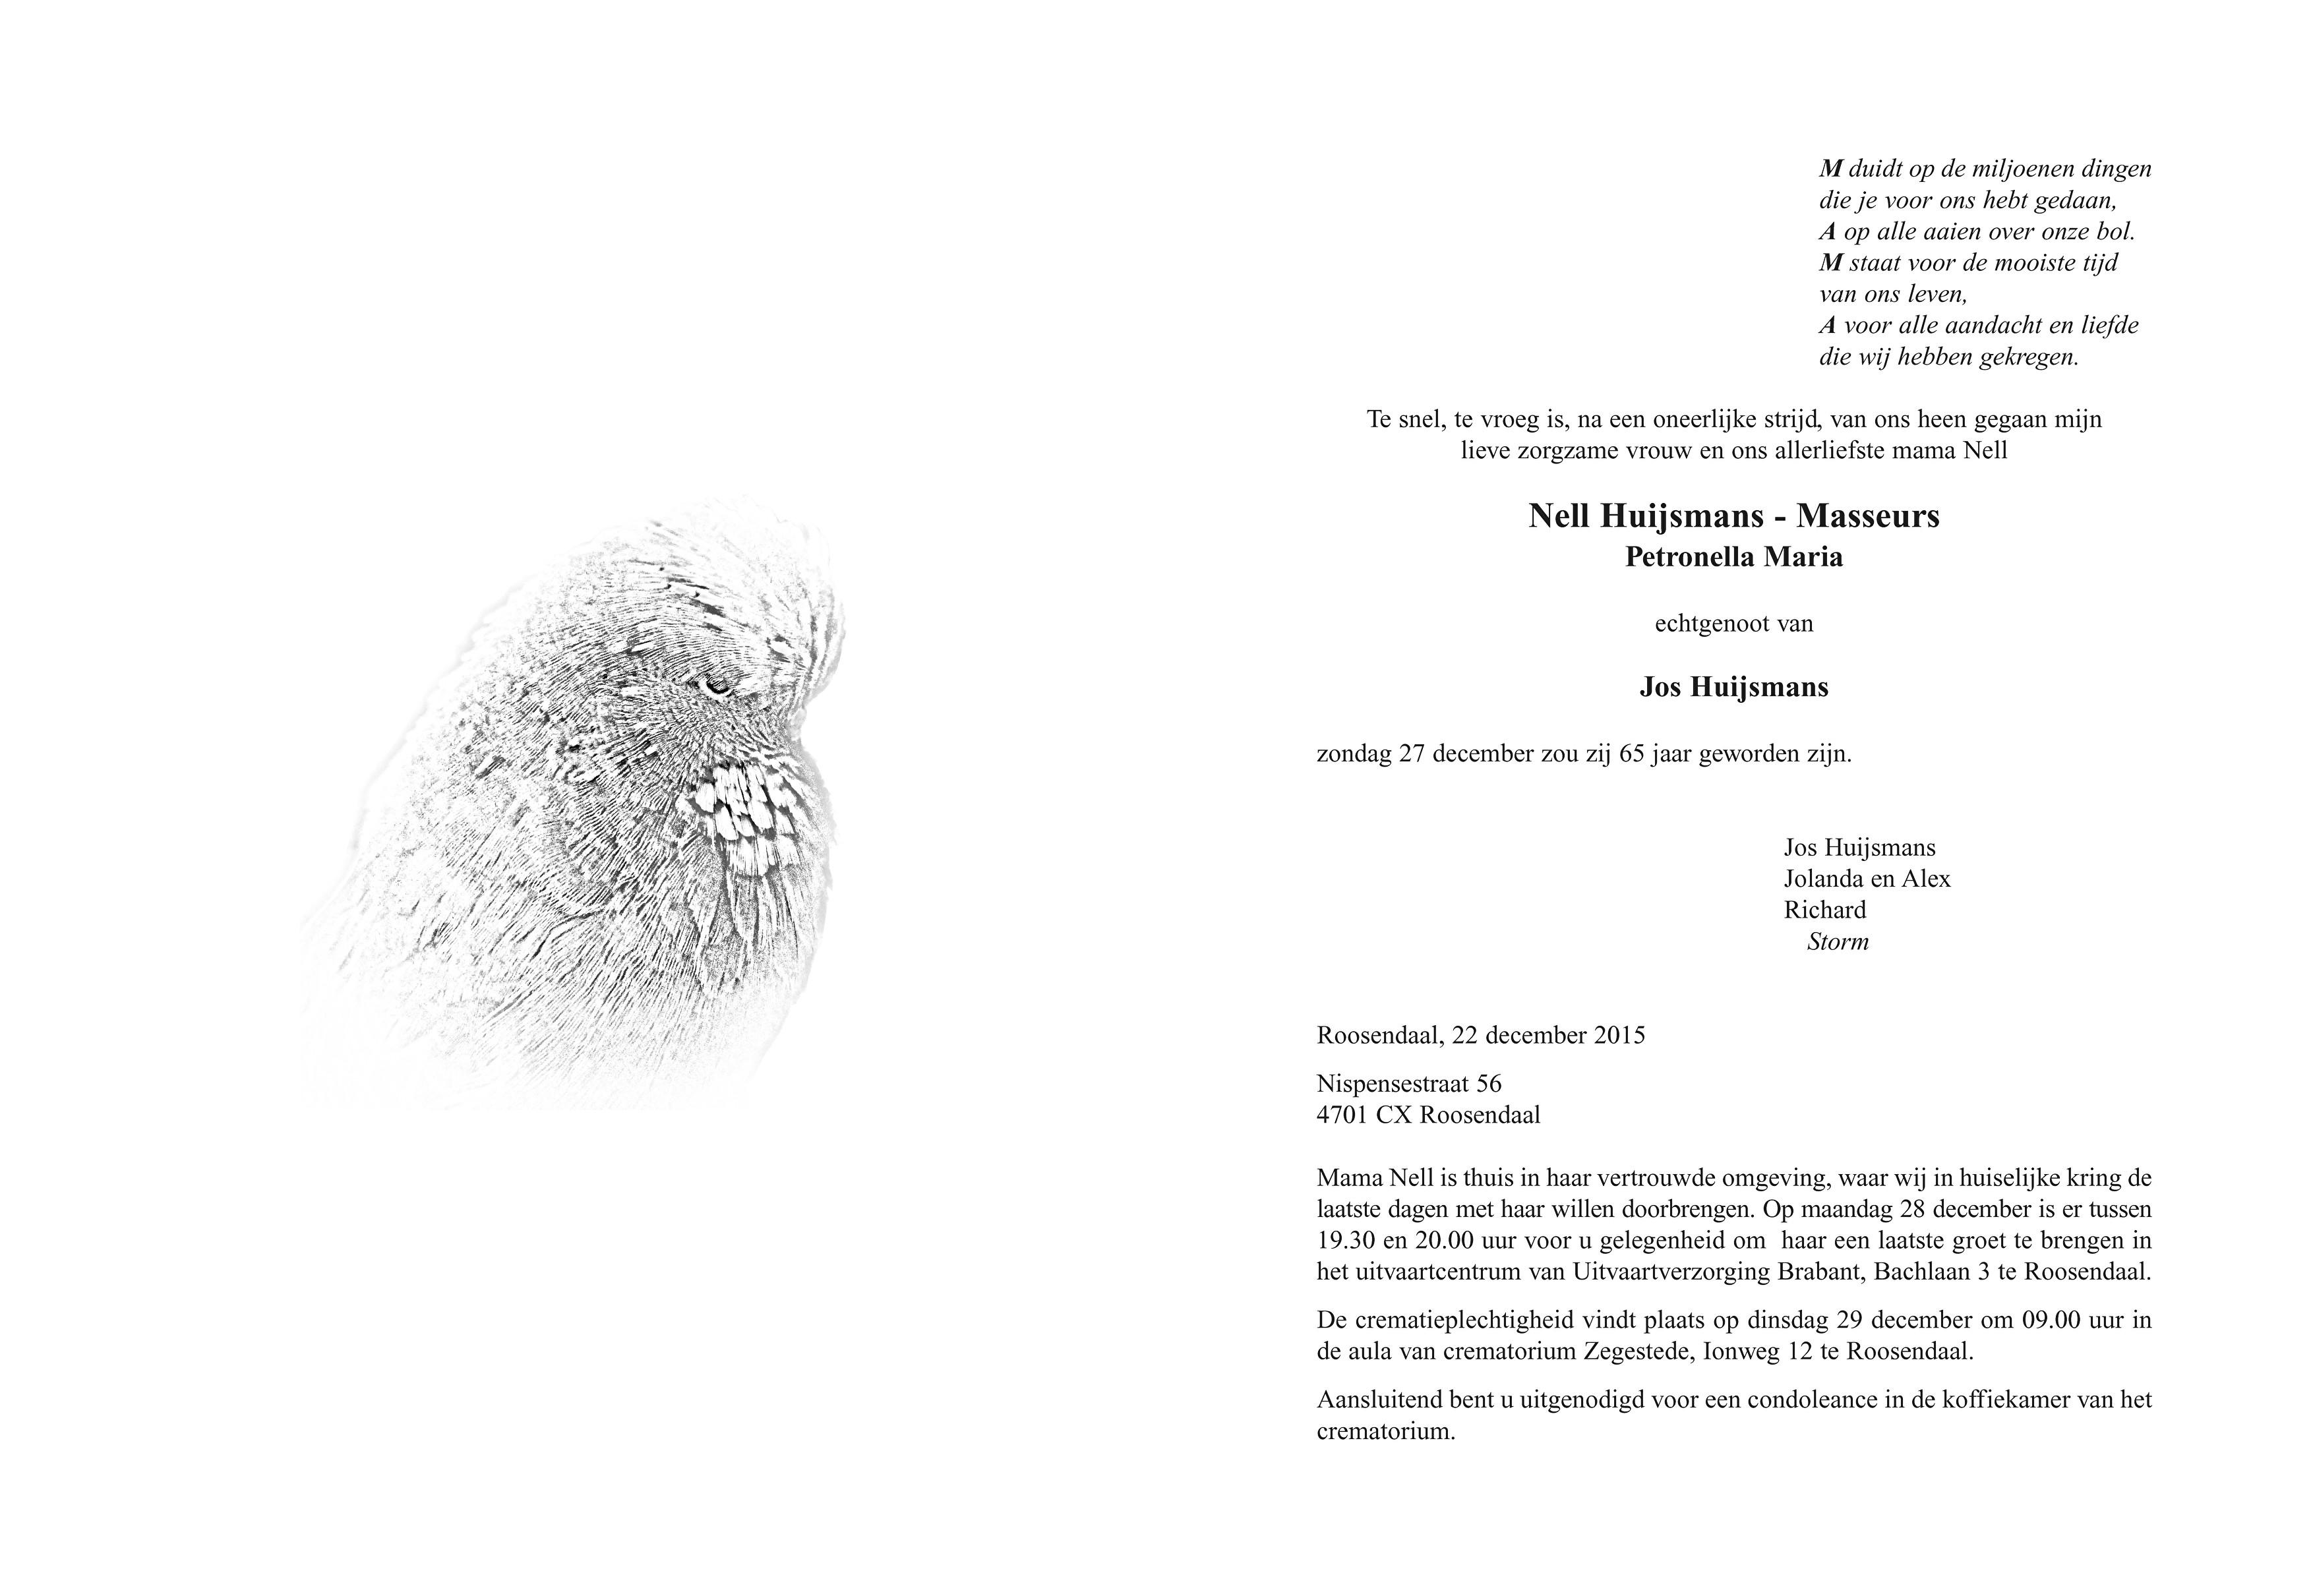 Nell Huijsmans - Masseurs Death notice